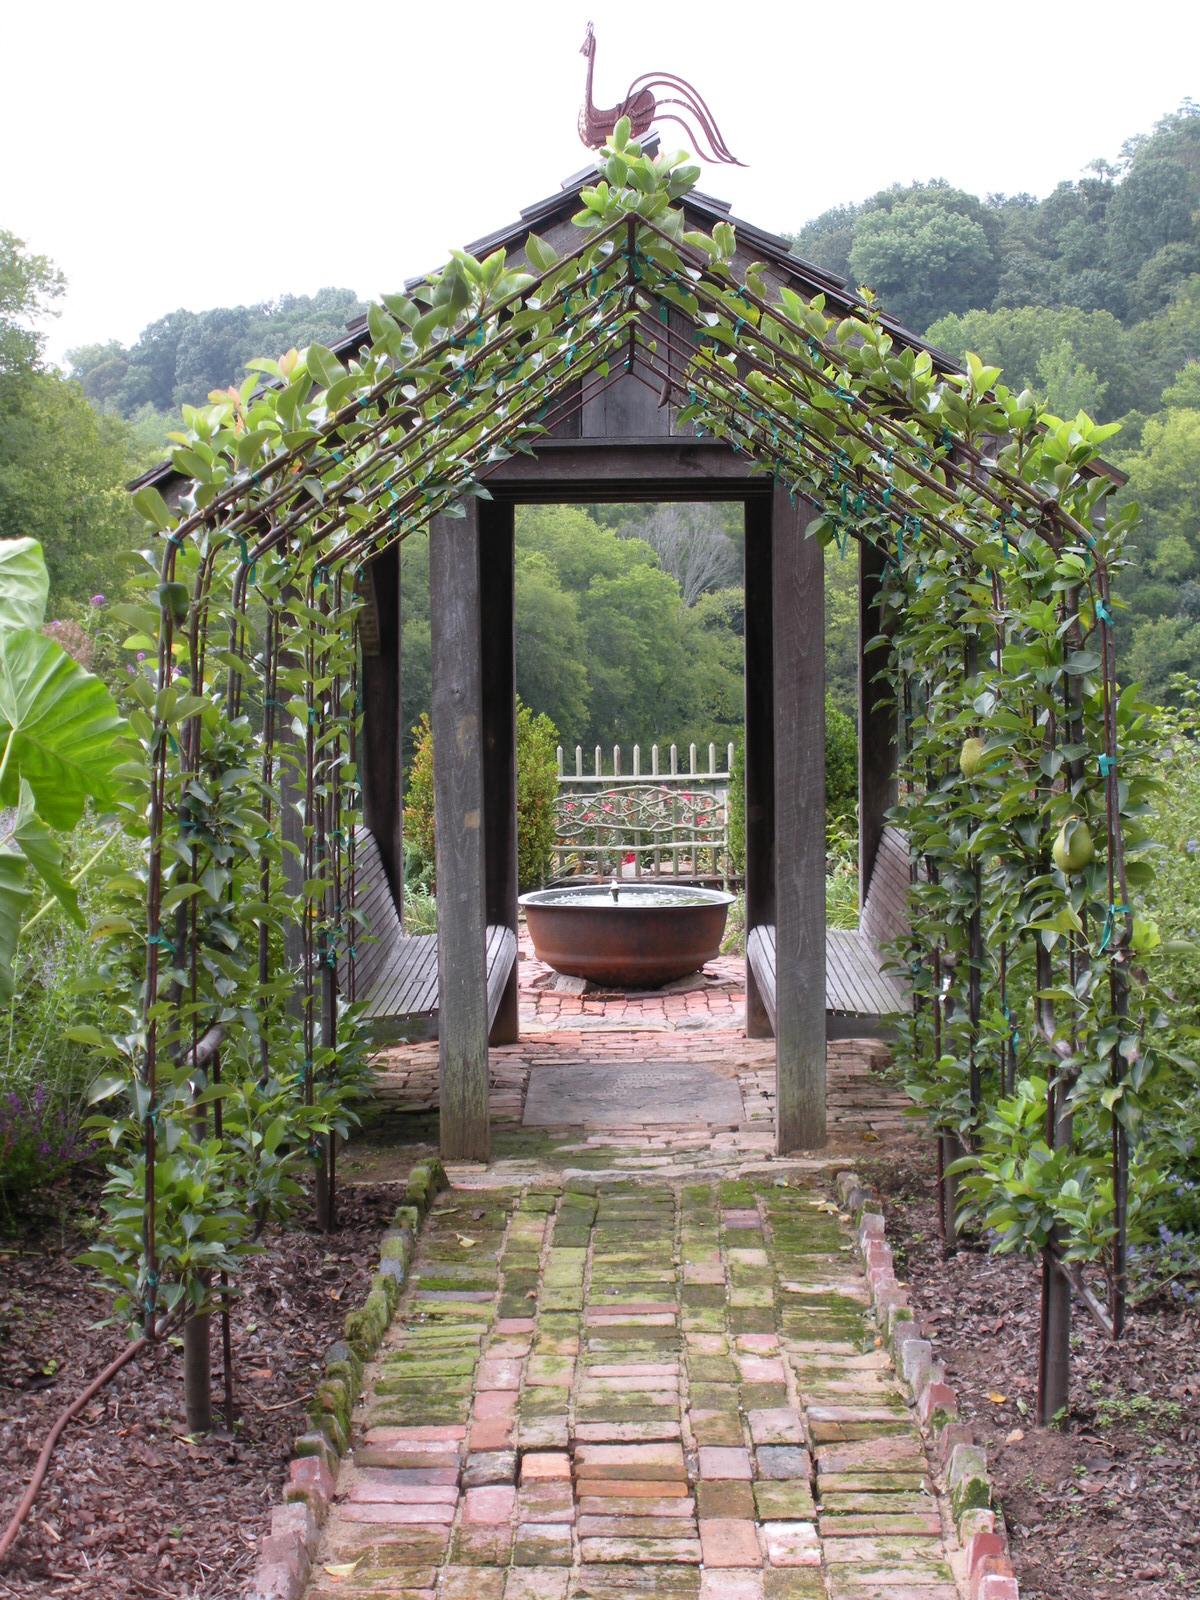 Justin Stelter Landscape Gardening - Country Garden - Justin Stelter Landscape Gardening - Country Garden2887086796_629e410b63_o.jpg